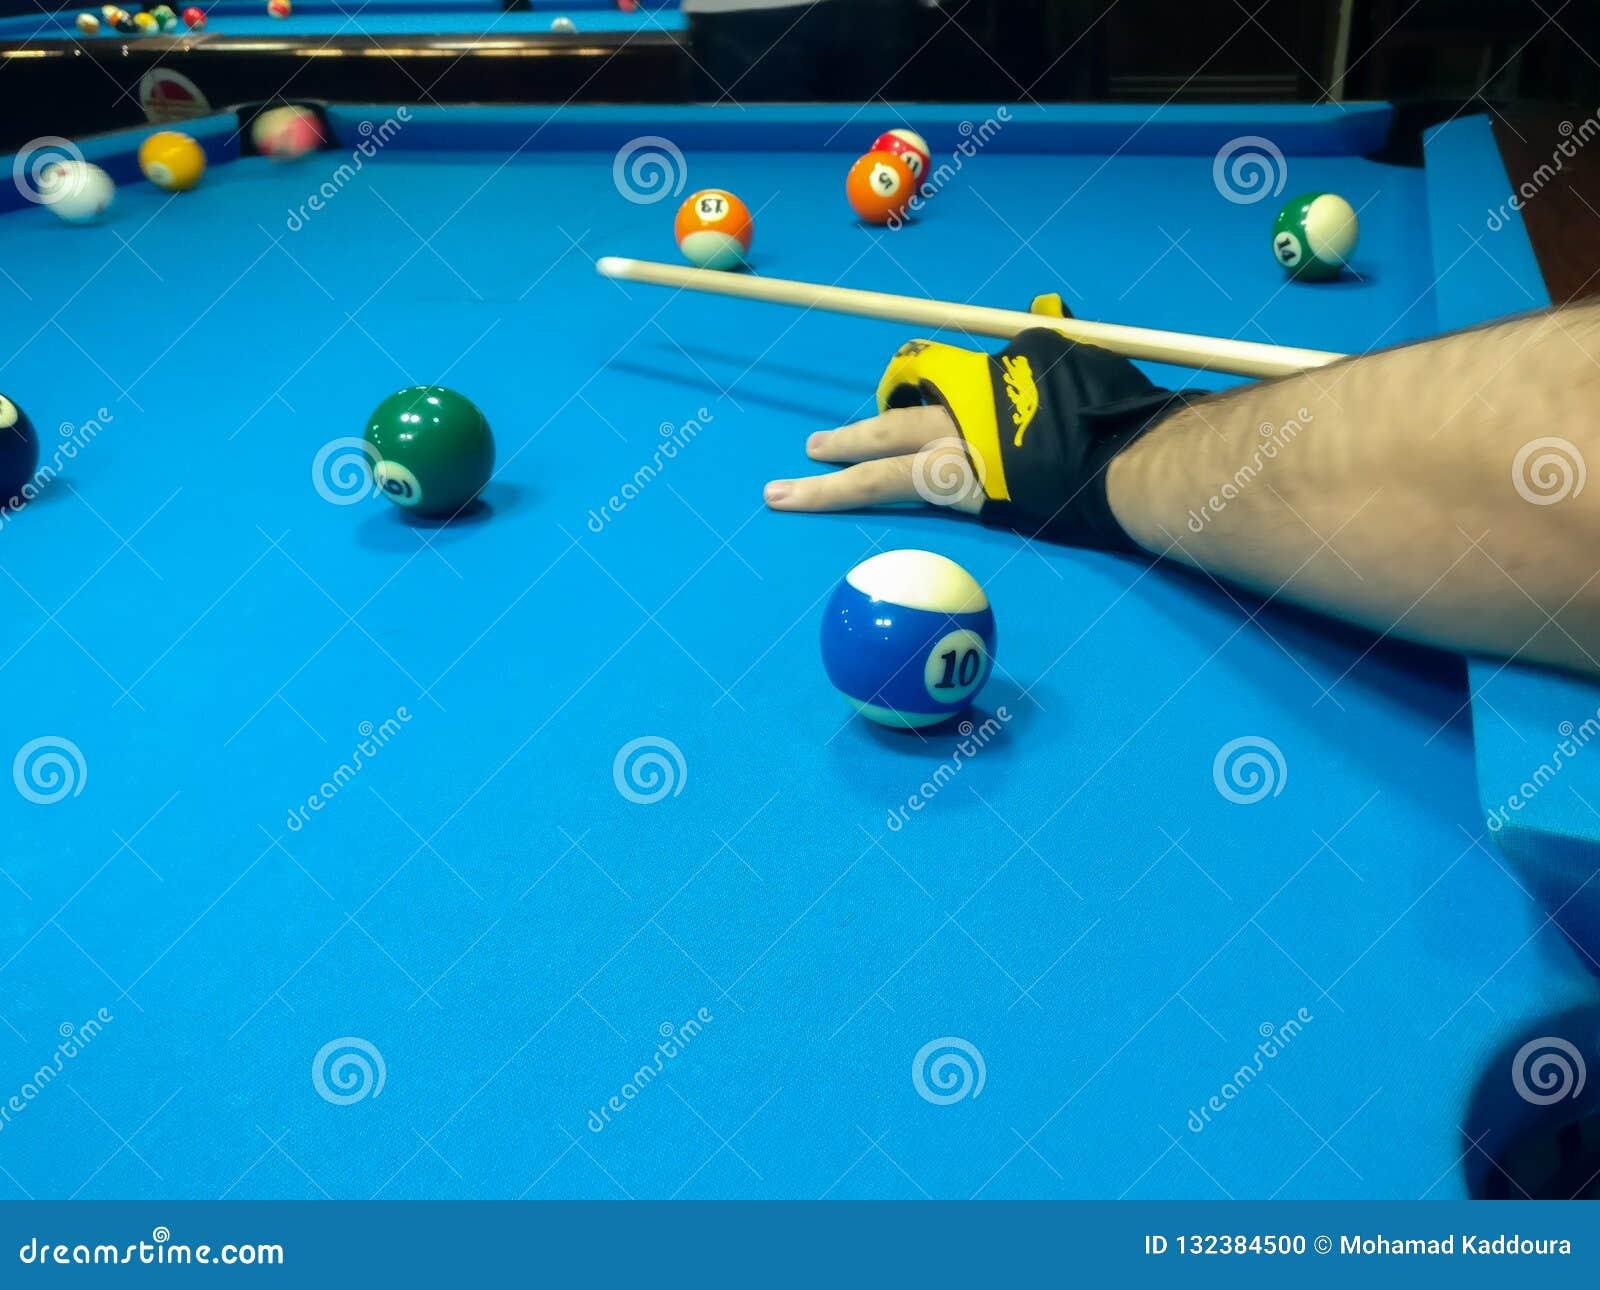 Snooker Player Stock Photo Cartoondealer Com 91103808